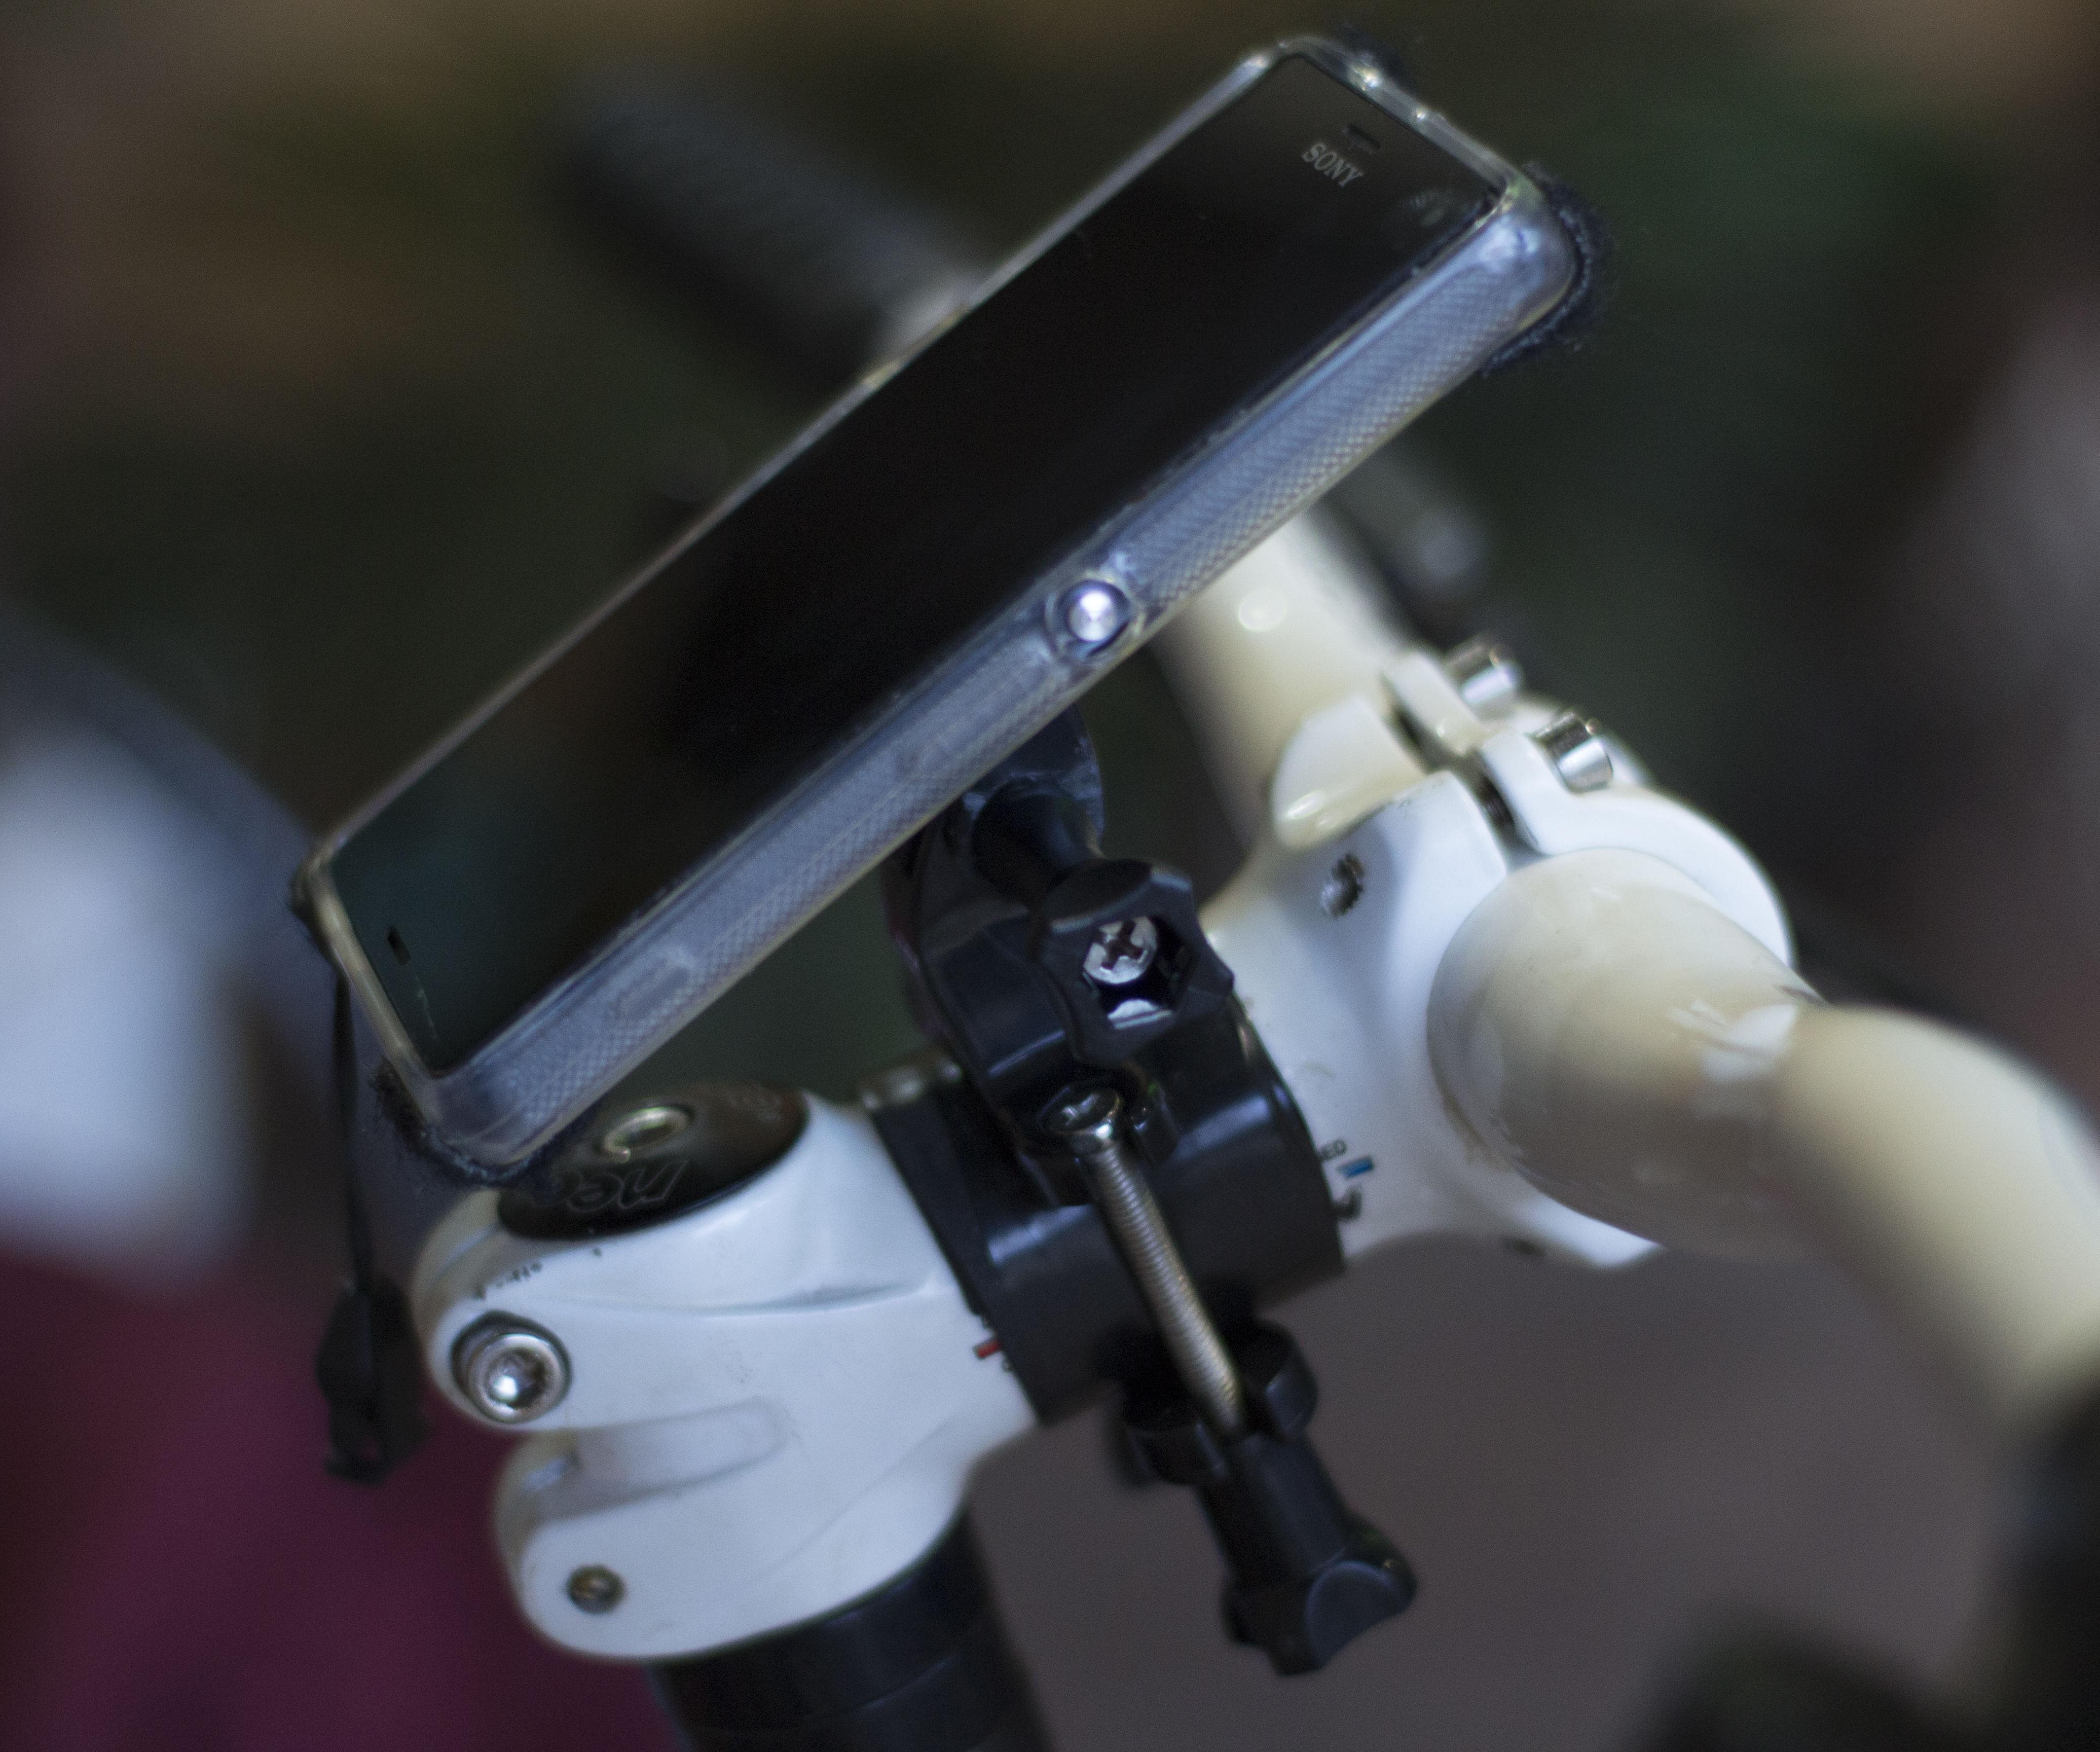 Bike Handlebar Smartphone Mount